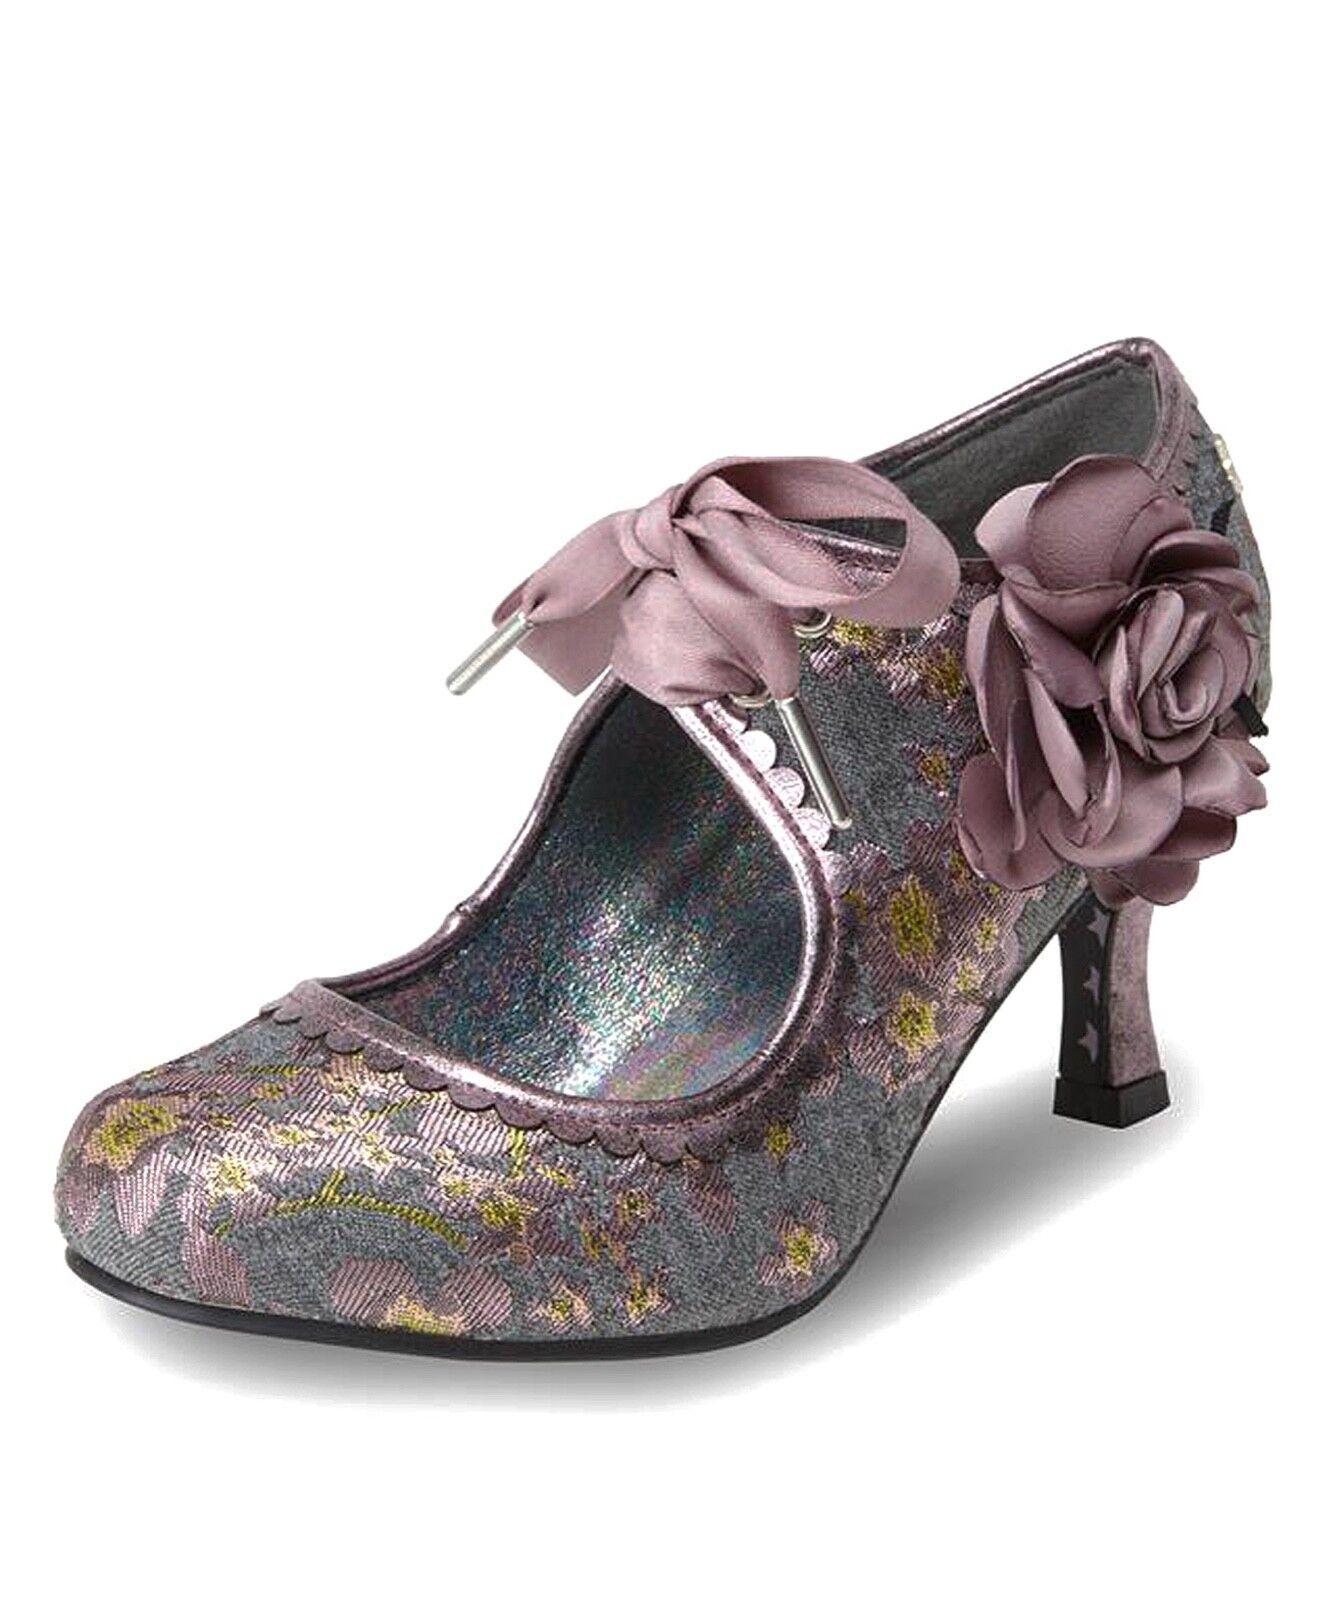 Joe brauns NEW Orla grau tweed lilac floral high heel lace up fashion schuhe 4-8